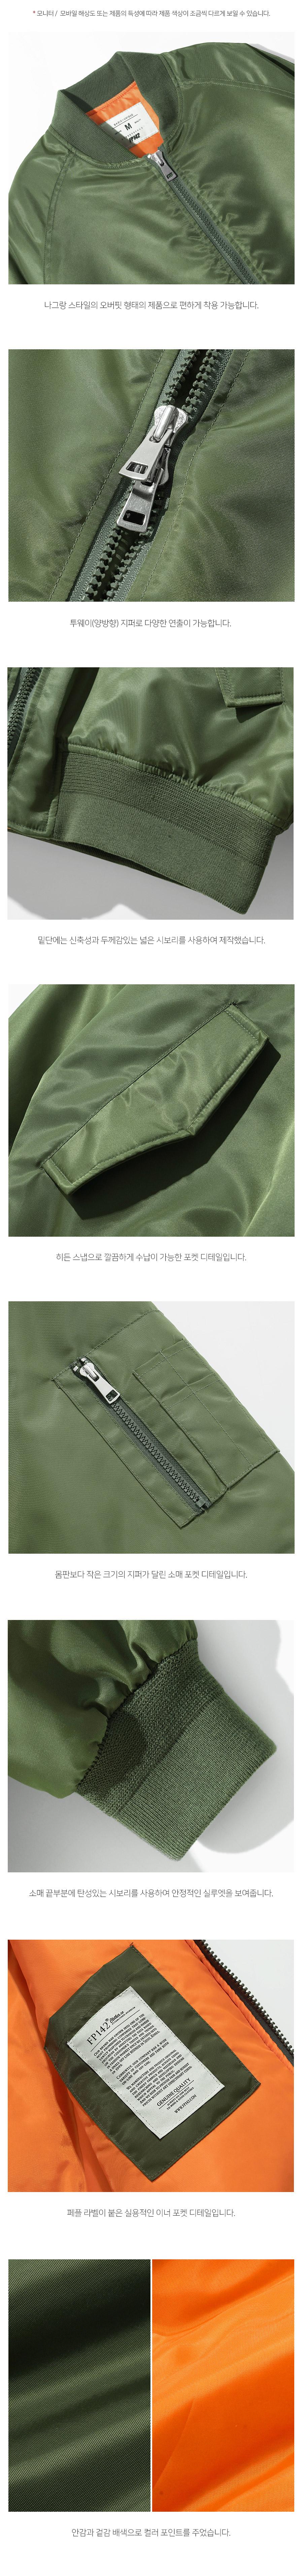 5_SJOT1303_detail_khaki_color02_ky.jpg